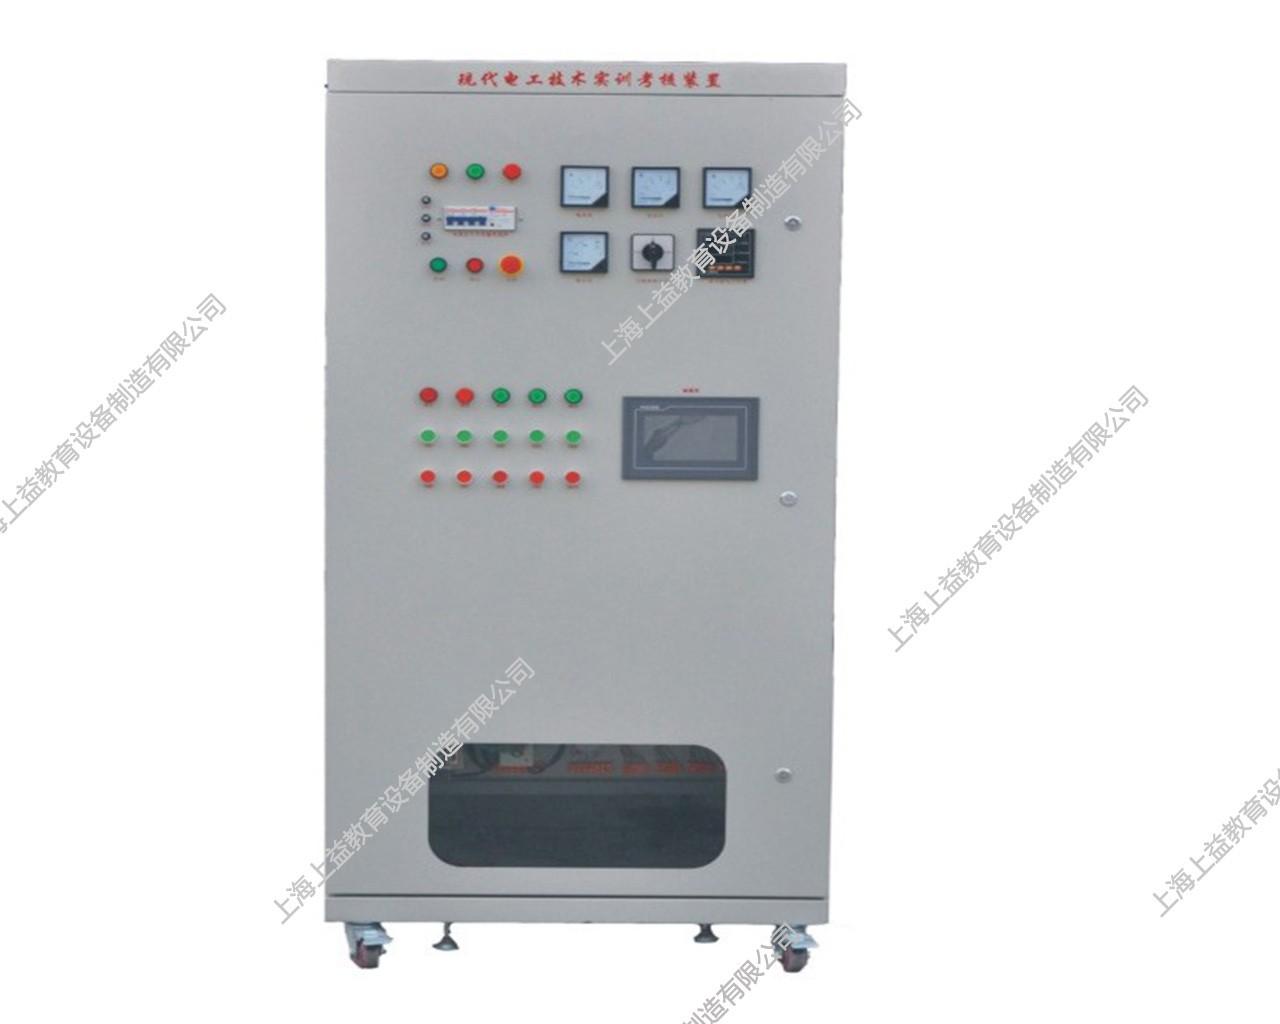 SYGSX-02A现代高级维修电工wwwlehu8viplehu68vip装置(柜式)